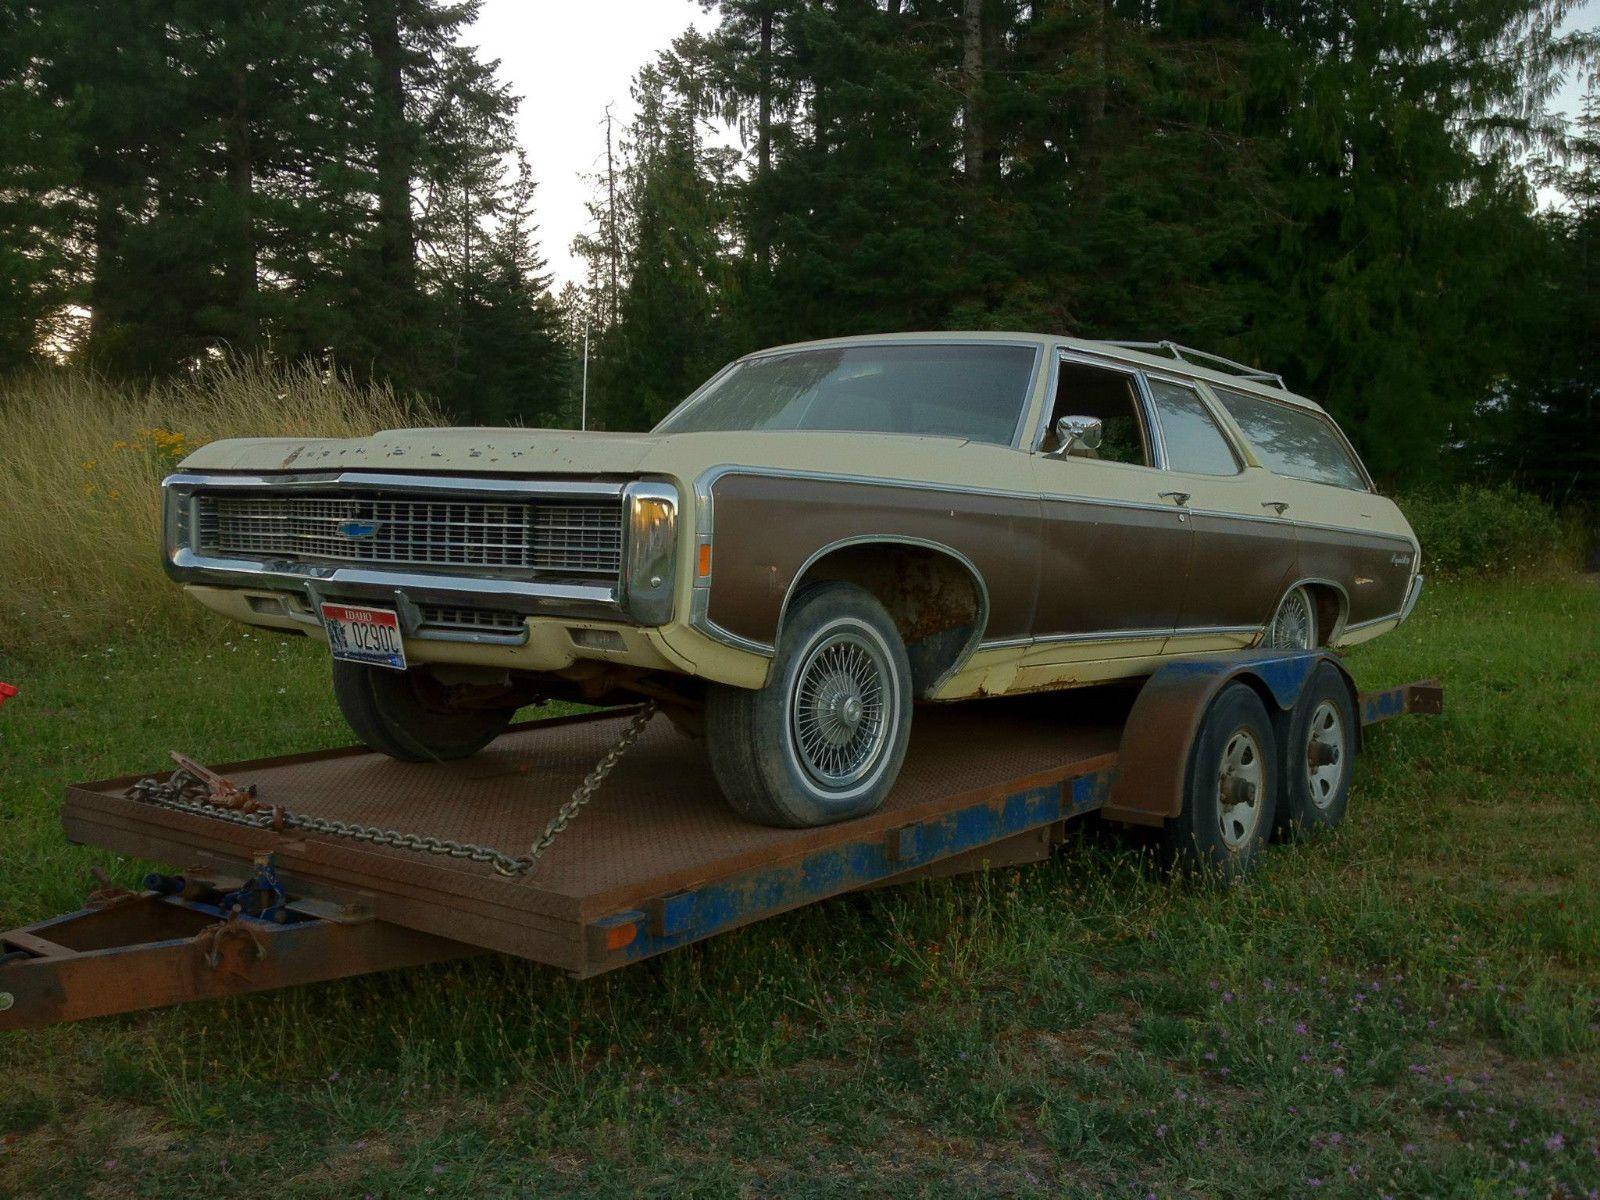 69 1969 caprice kingswood estate wagon hideaway headlights bbc 9 passenger classic chevrolet caprice 1969